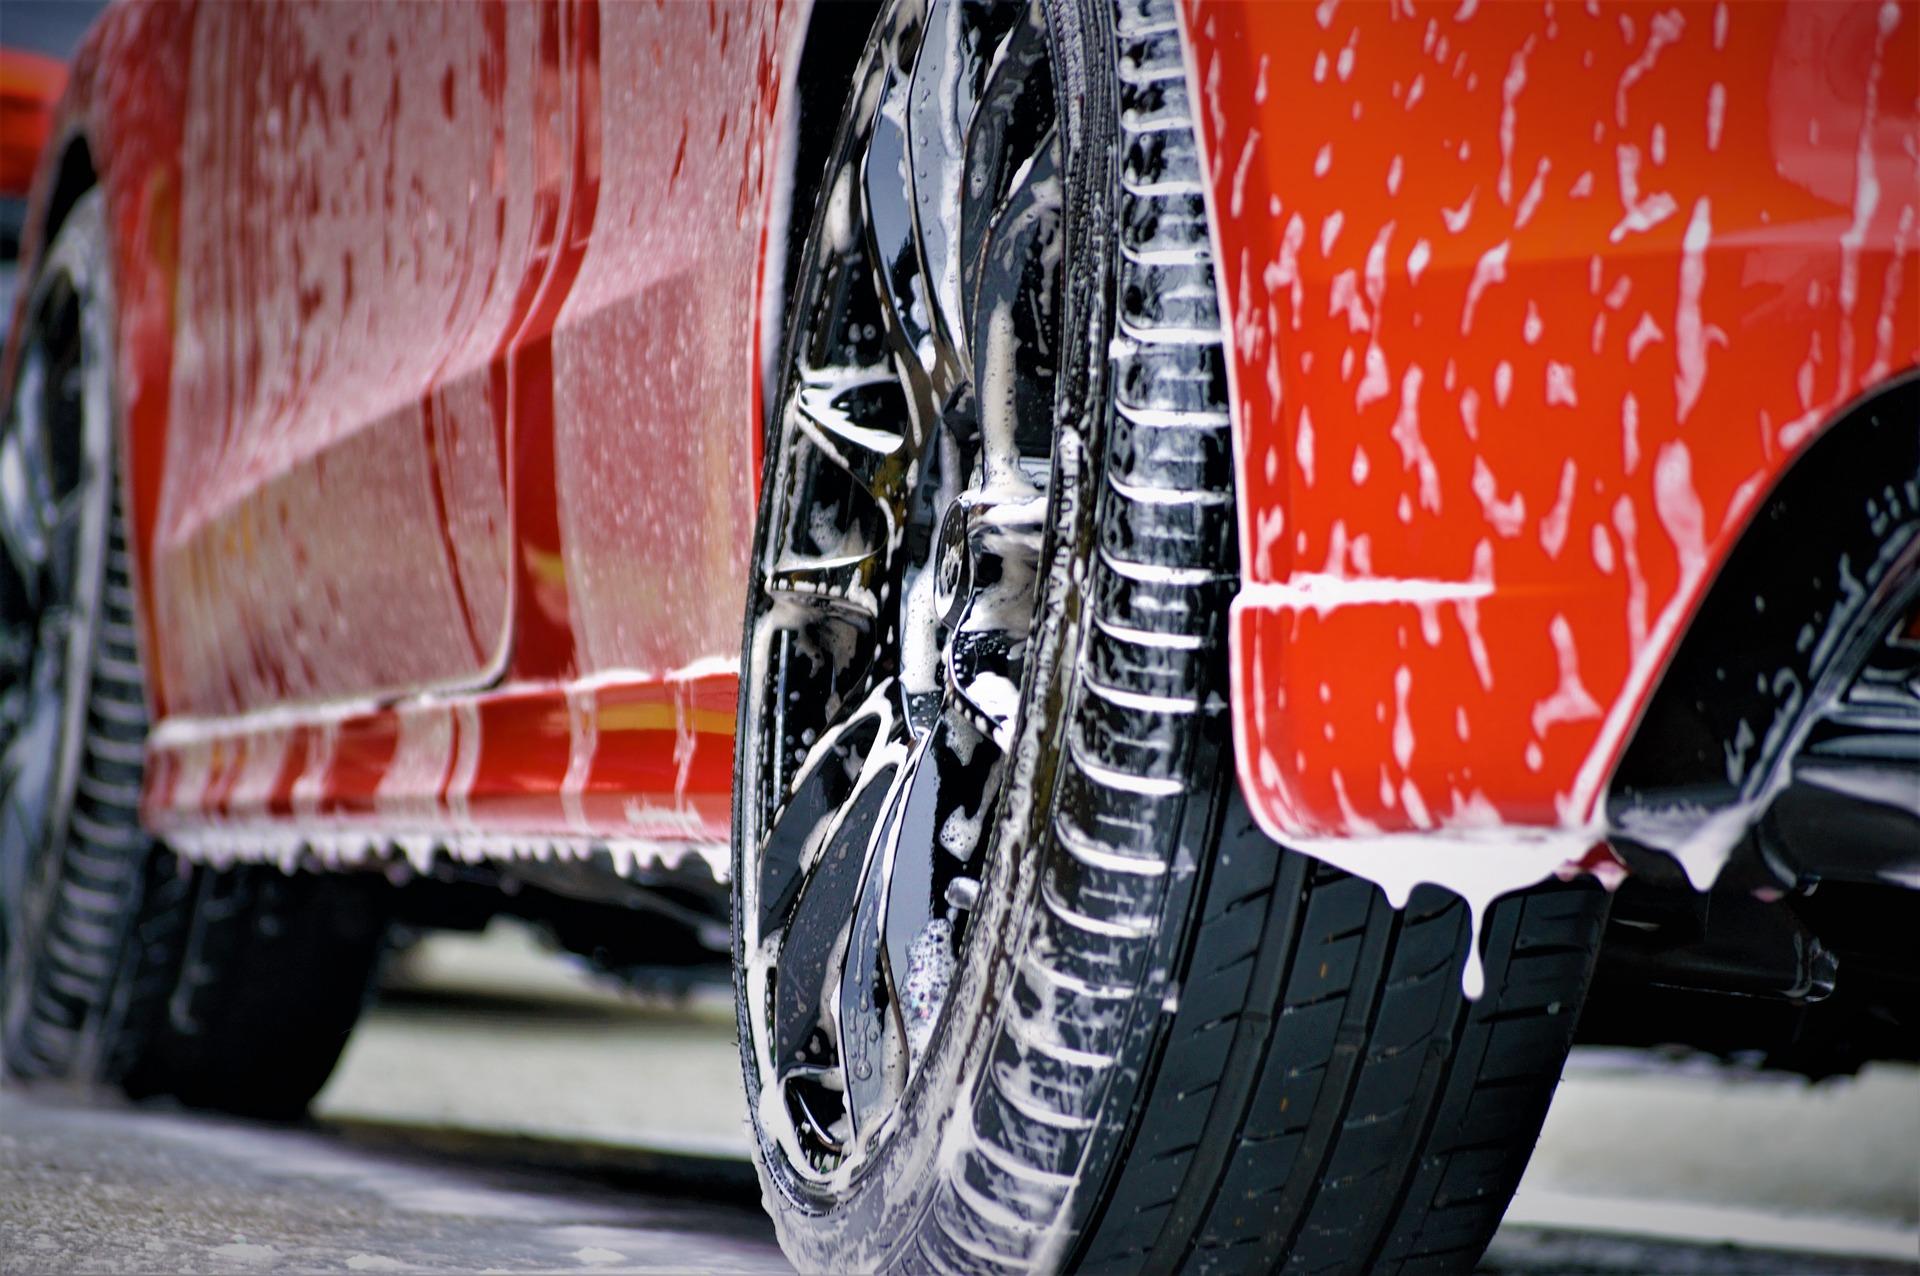 car-wash-3960877_1920